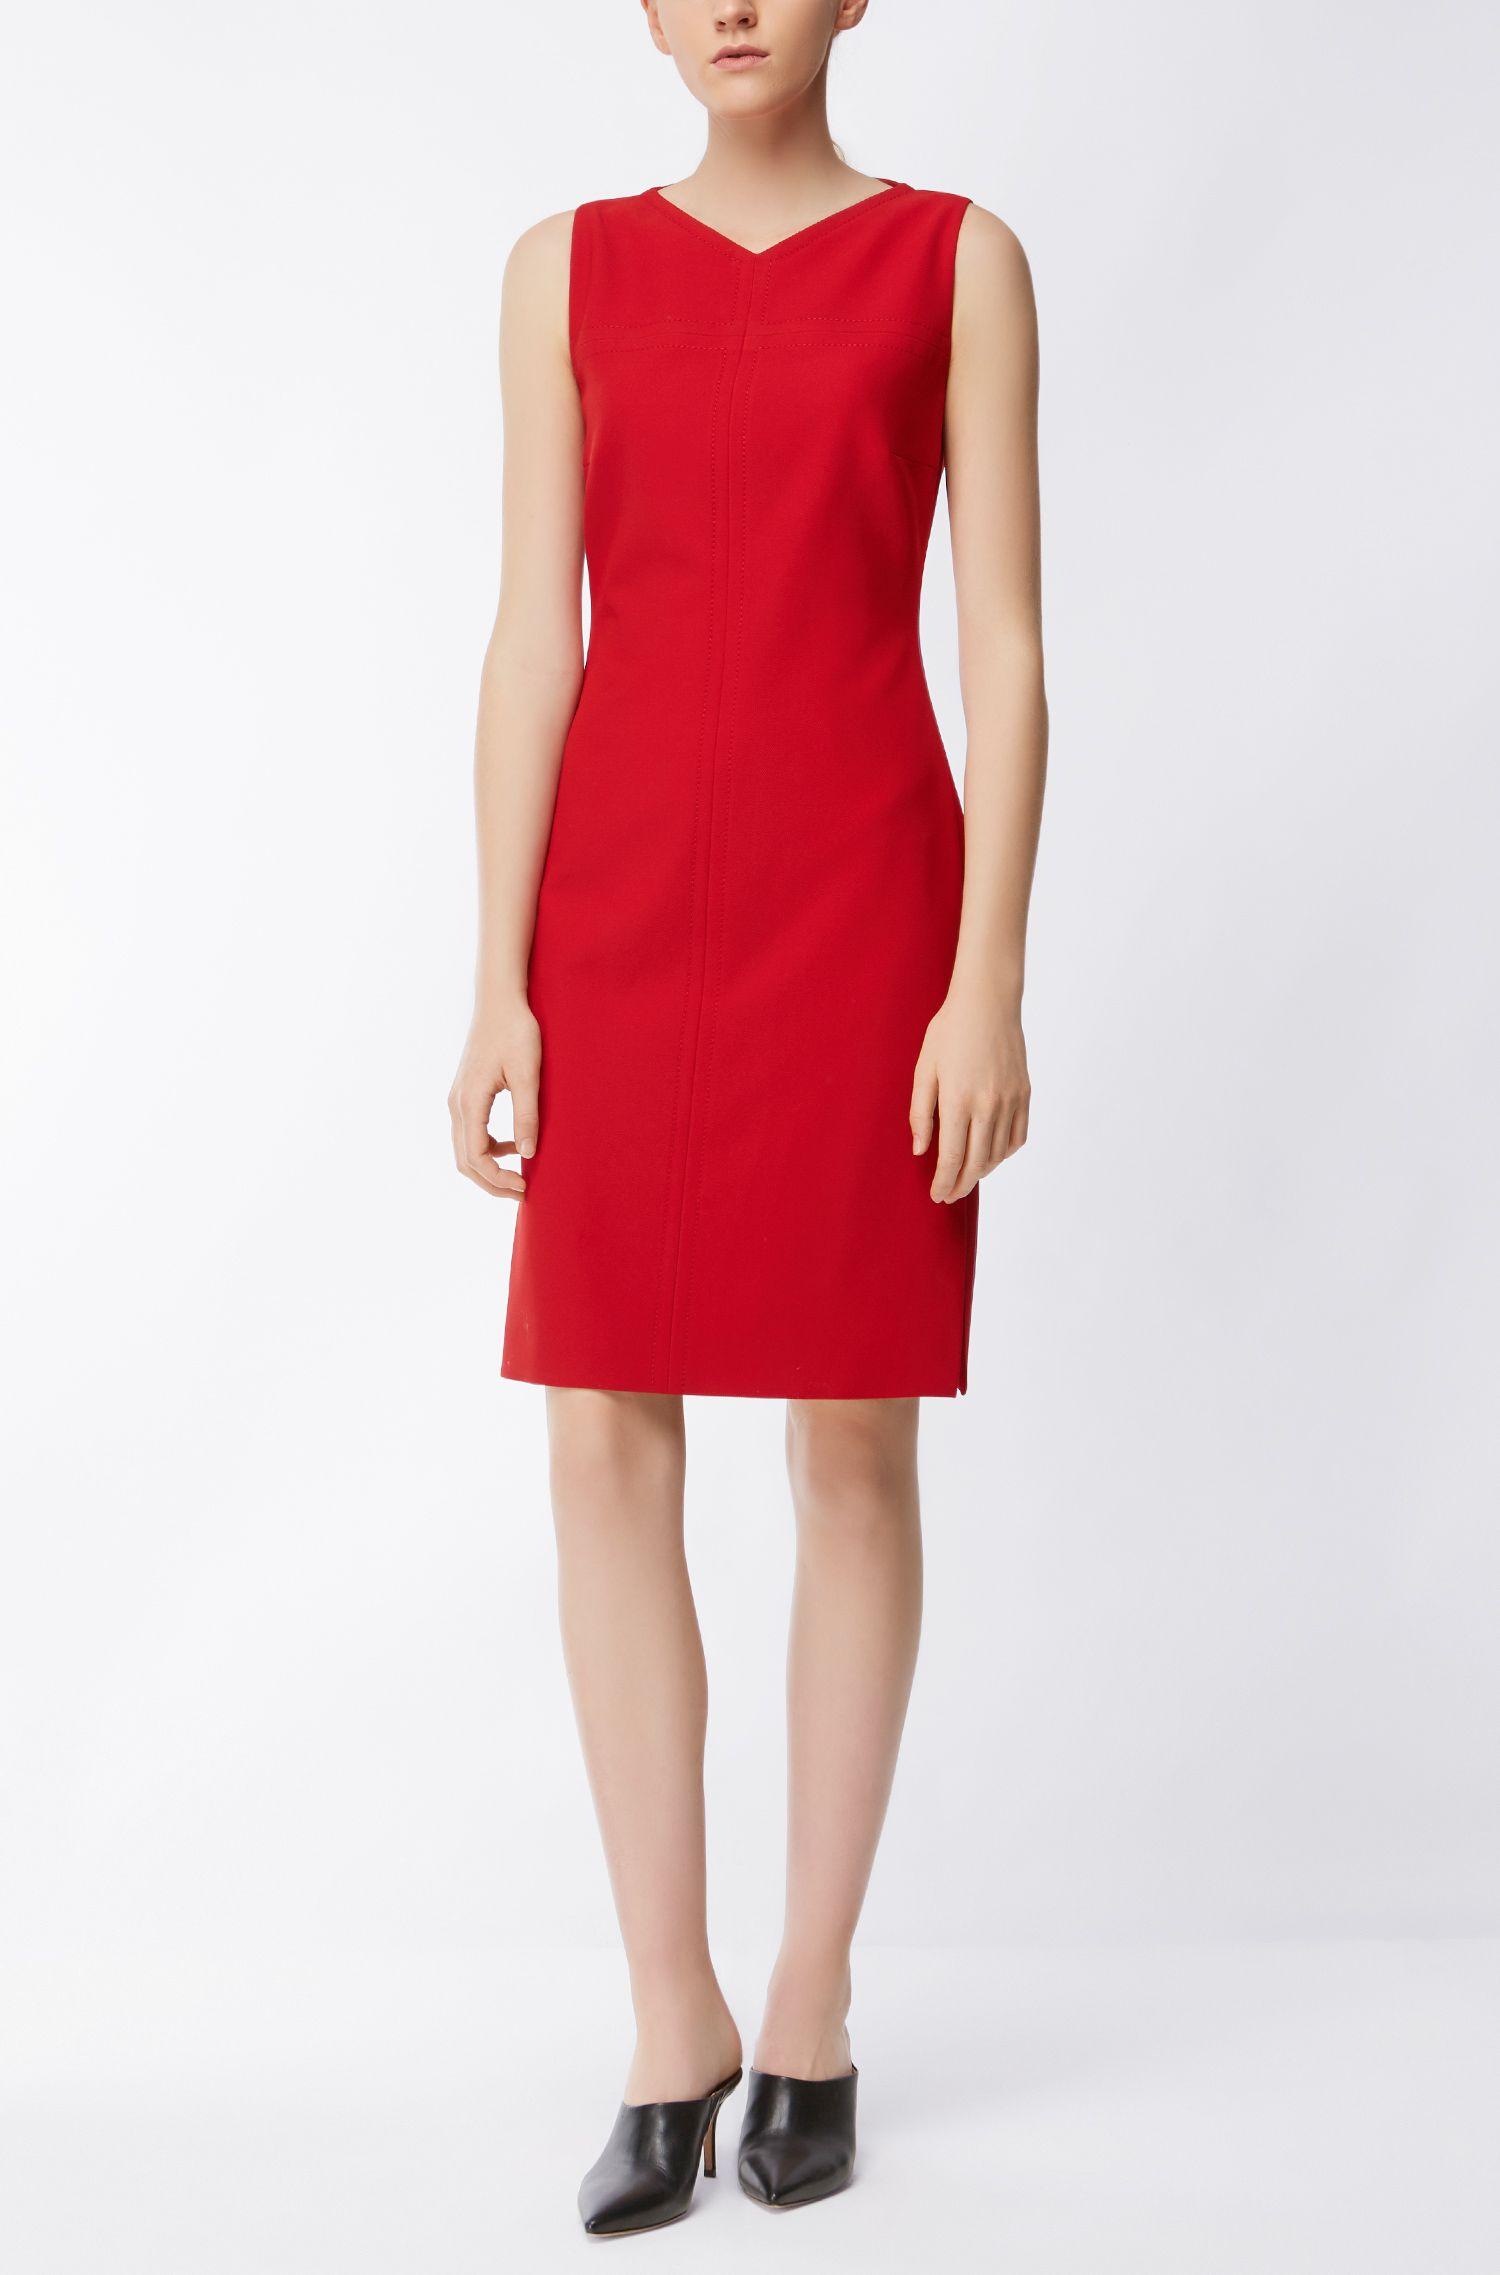 Sleeveless dress with V neckline